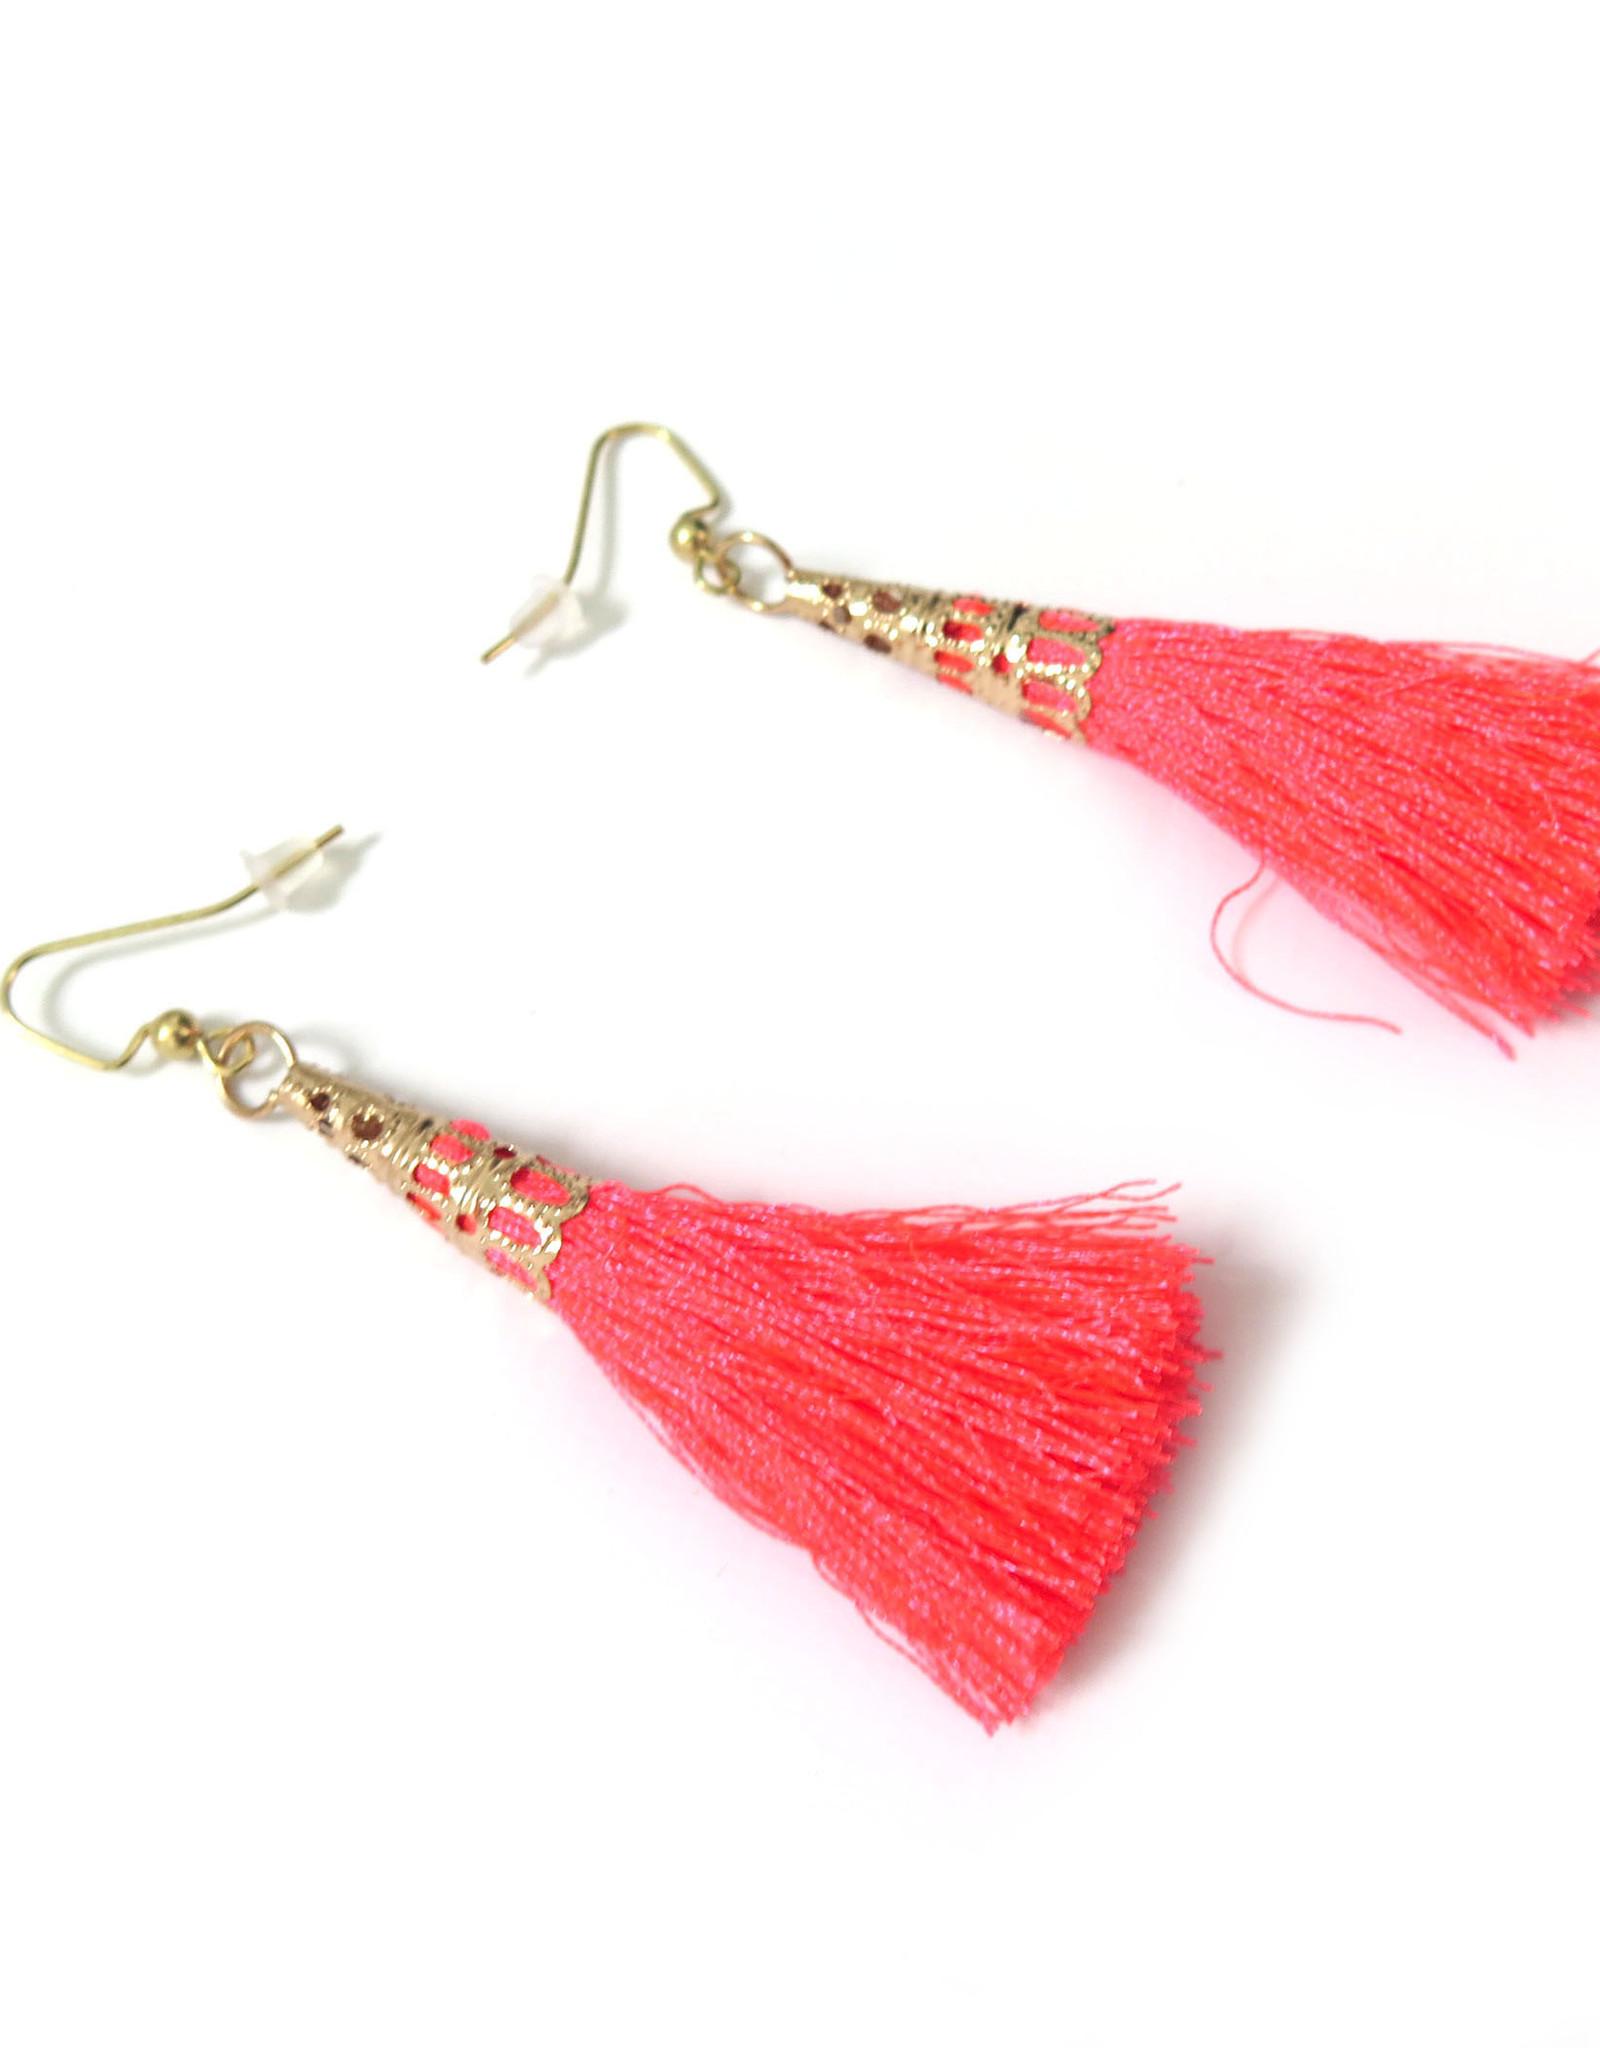 Hot Pink Tassle Earrings, Dana Diederich